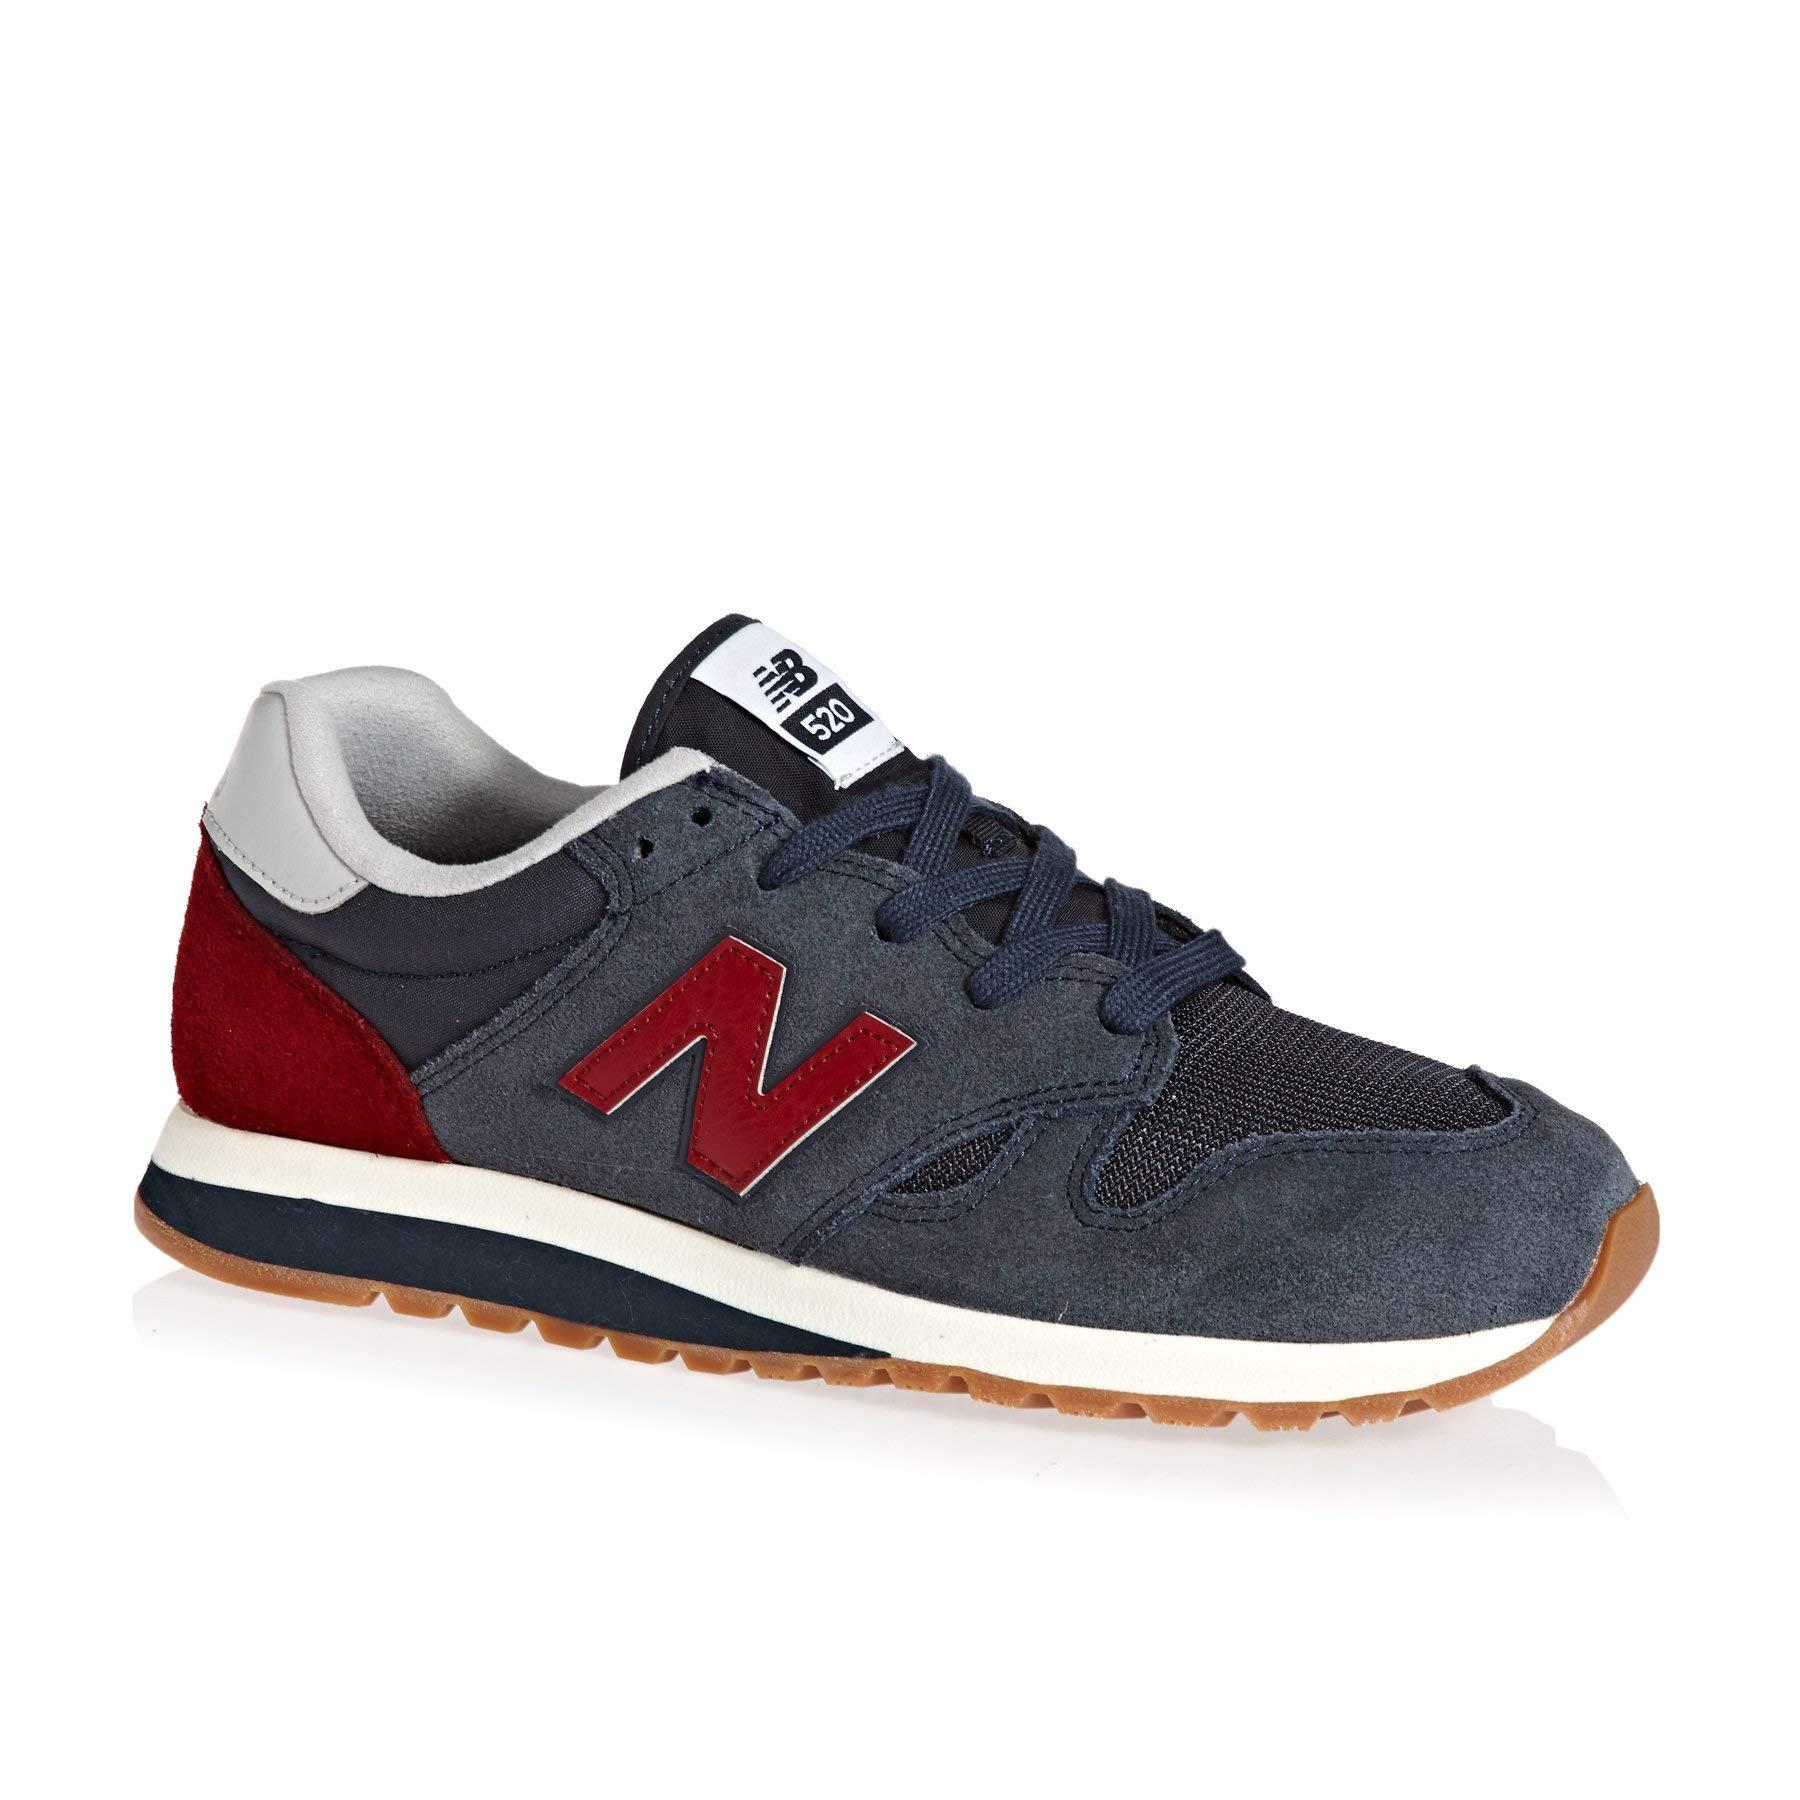 New Balance Men's 520v1 Sneaker, Outer Space, 8.5 D US